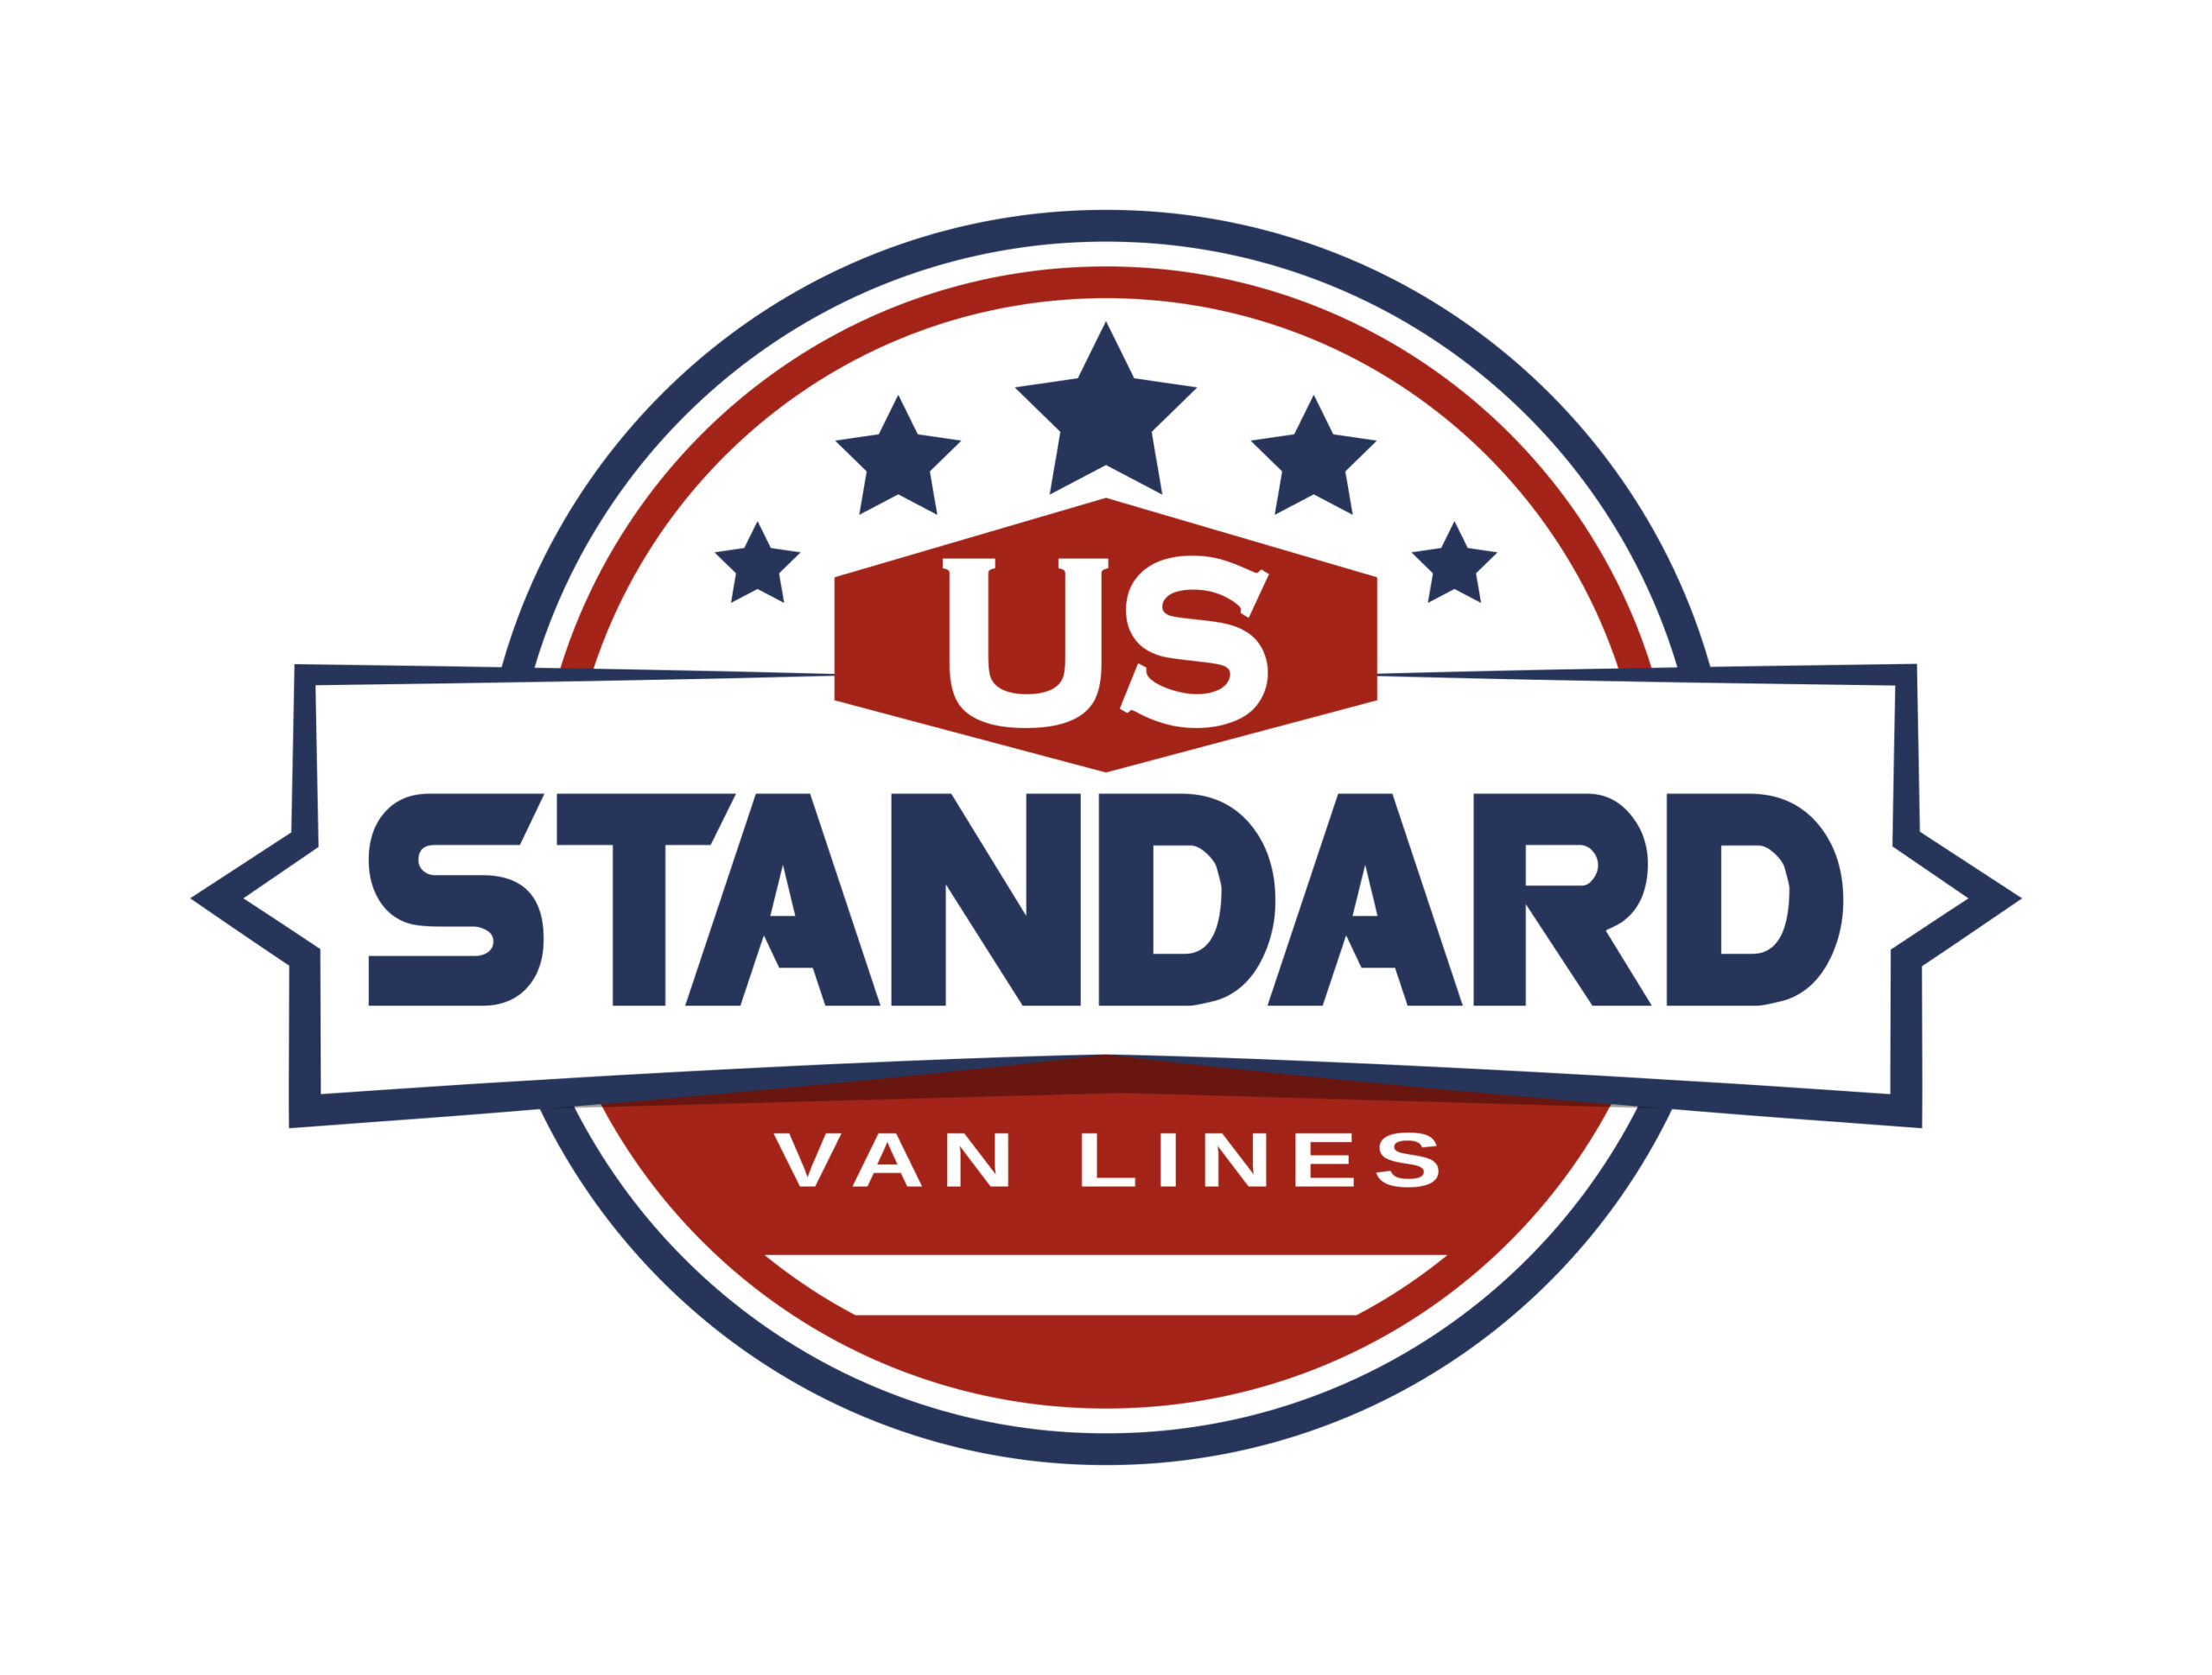 us standard van lines